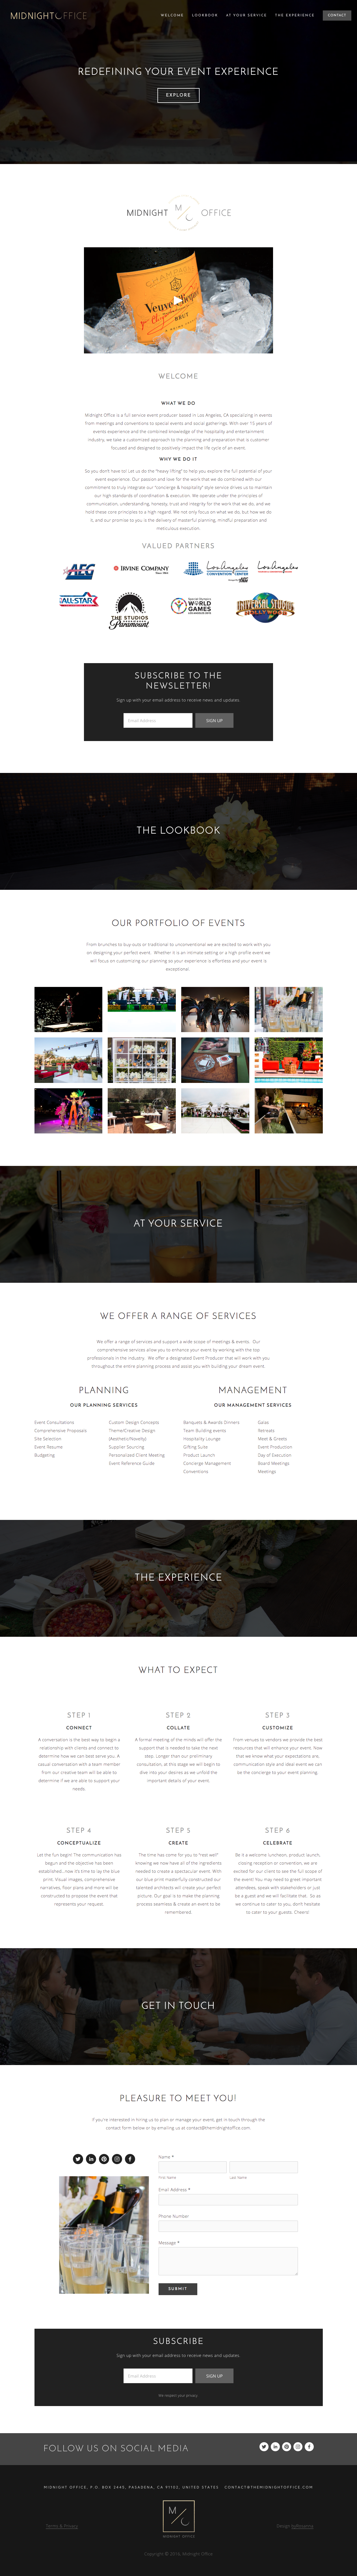 The Midnight Office Website